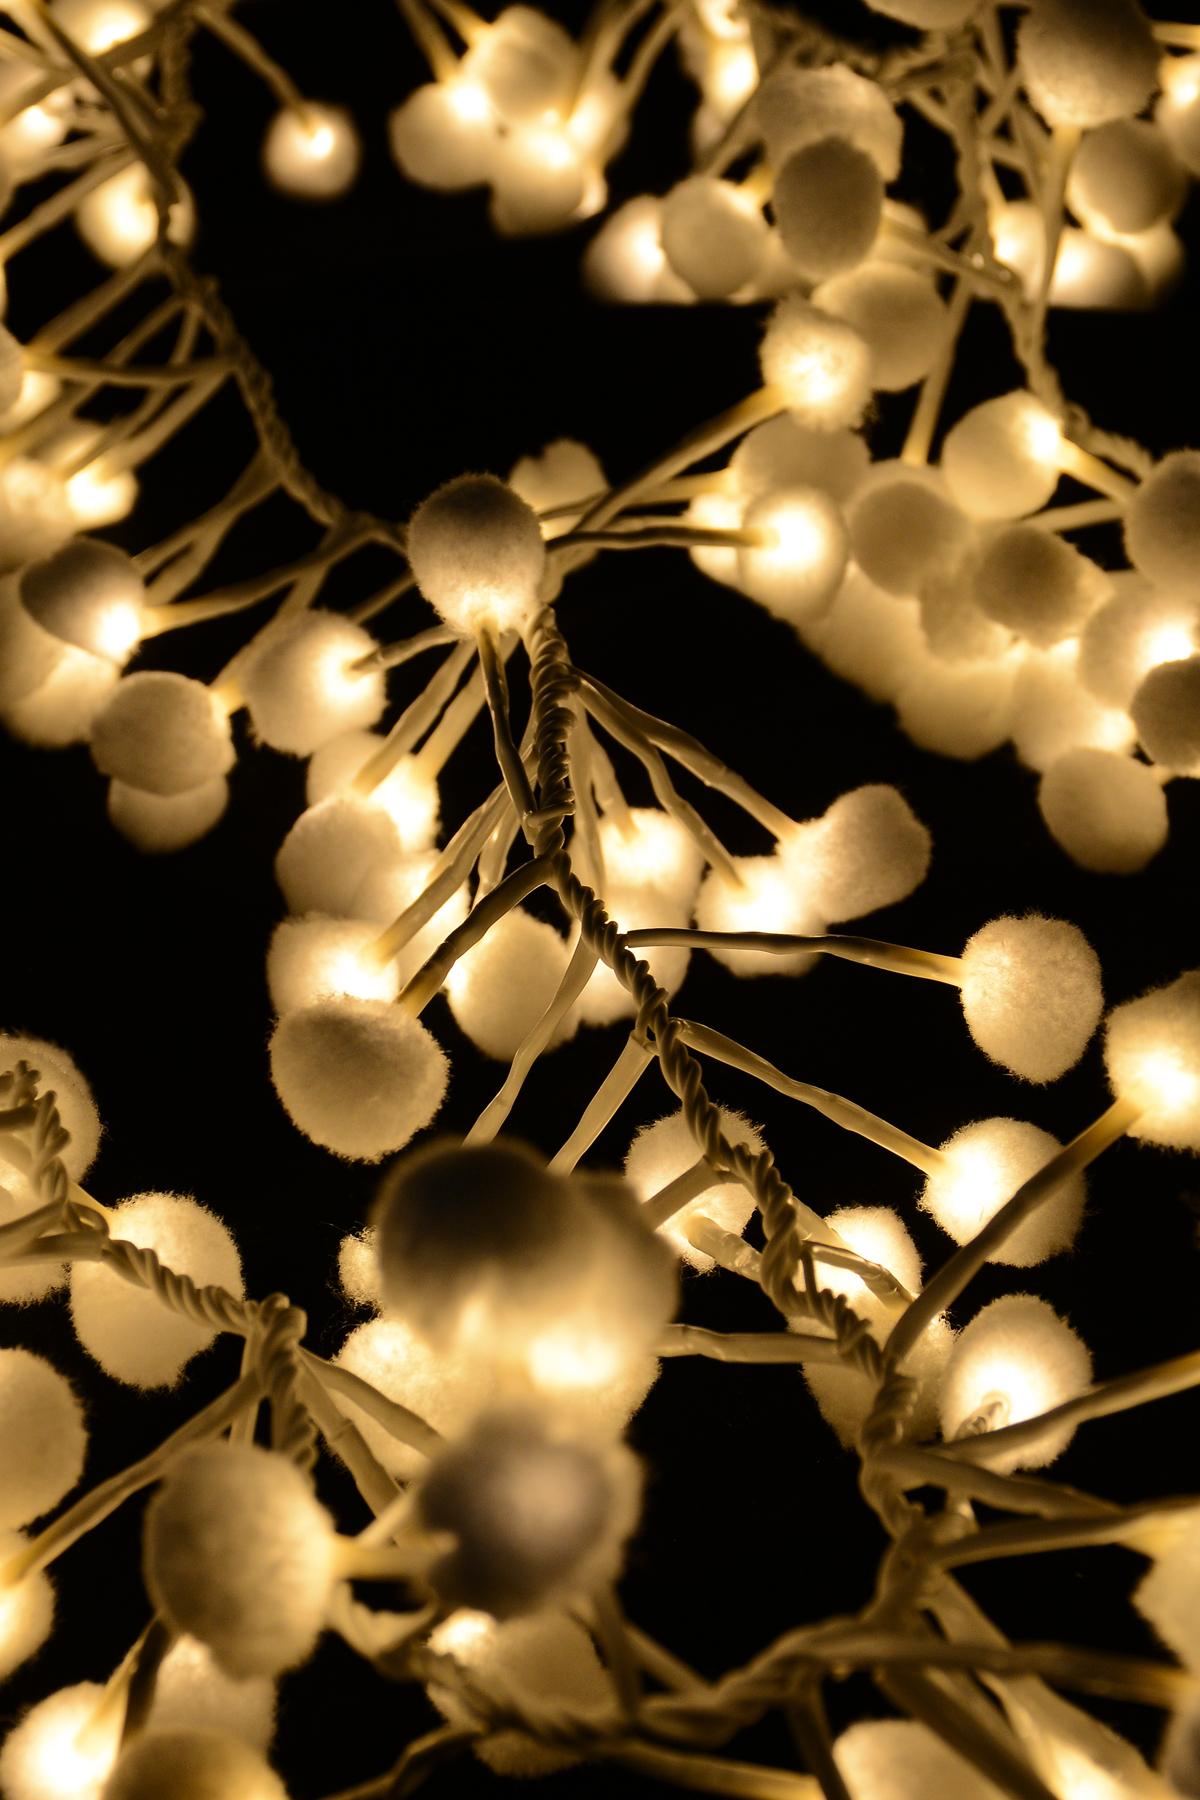 "Гирлянда новогодняя электрическая Winter Wings ""Шары"", 192 лампы, 4,8 м. N11286"